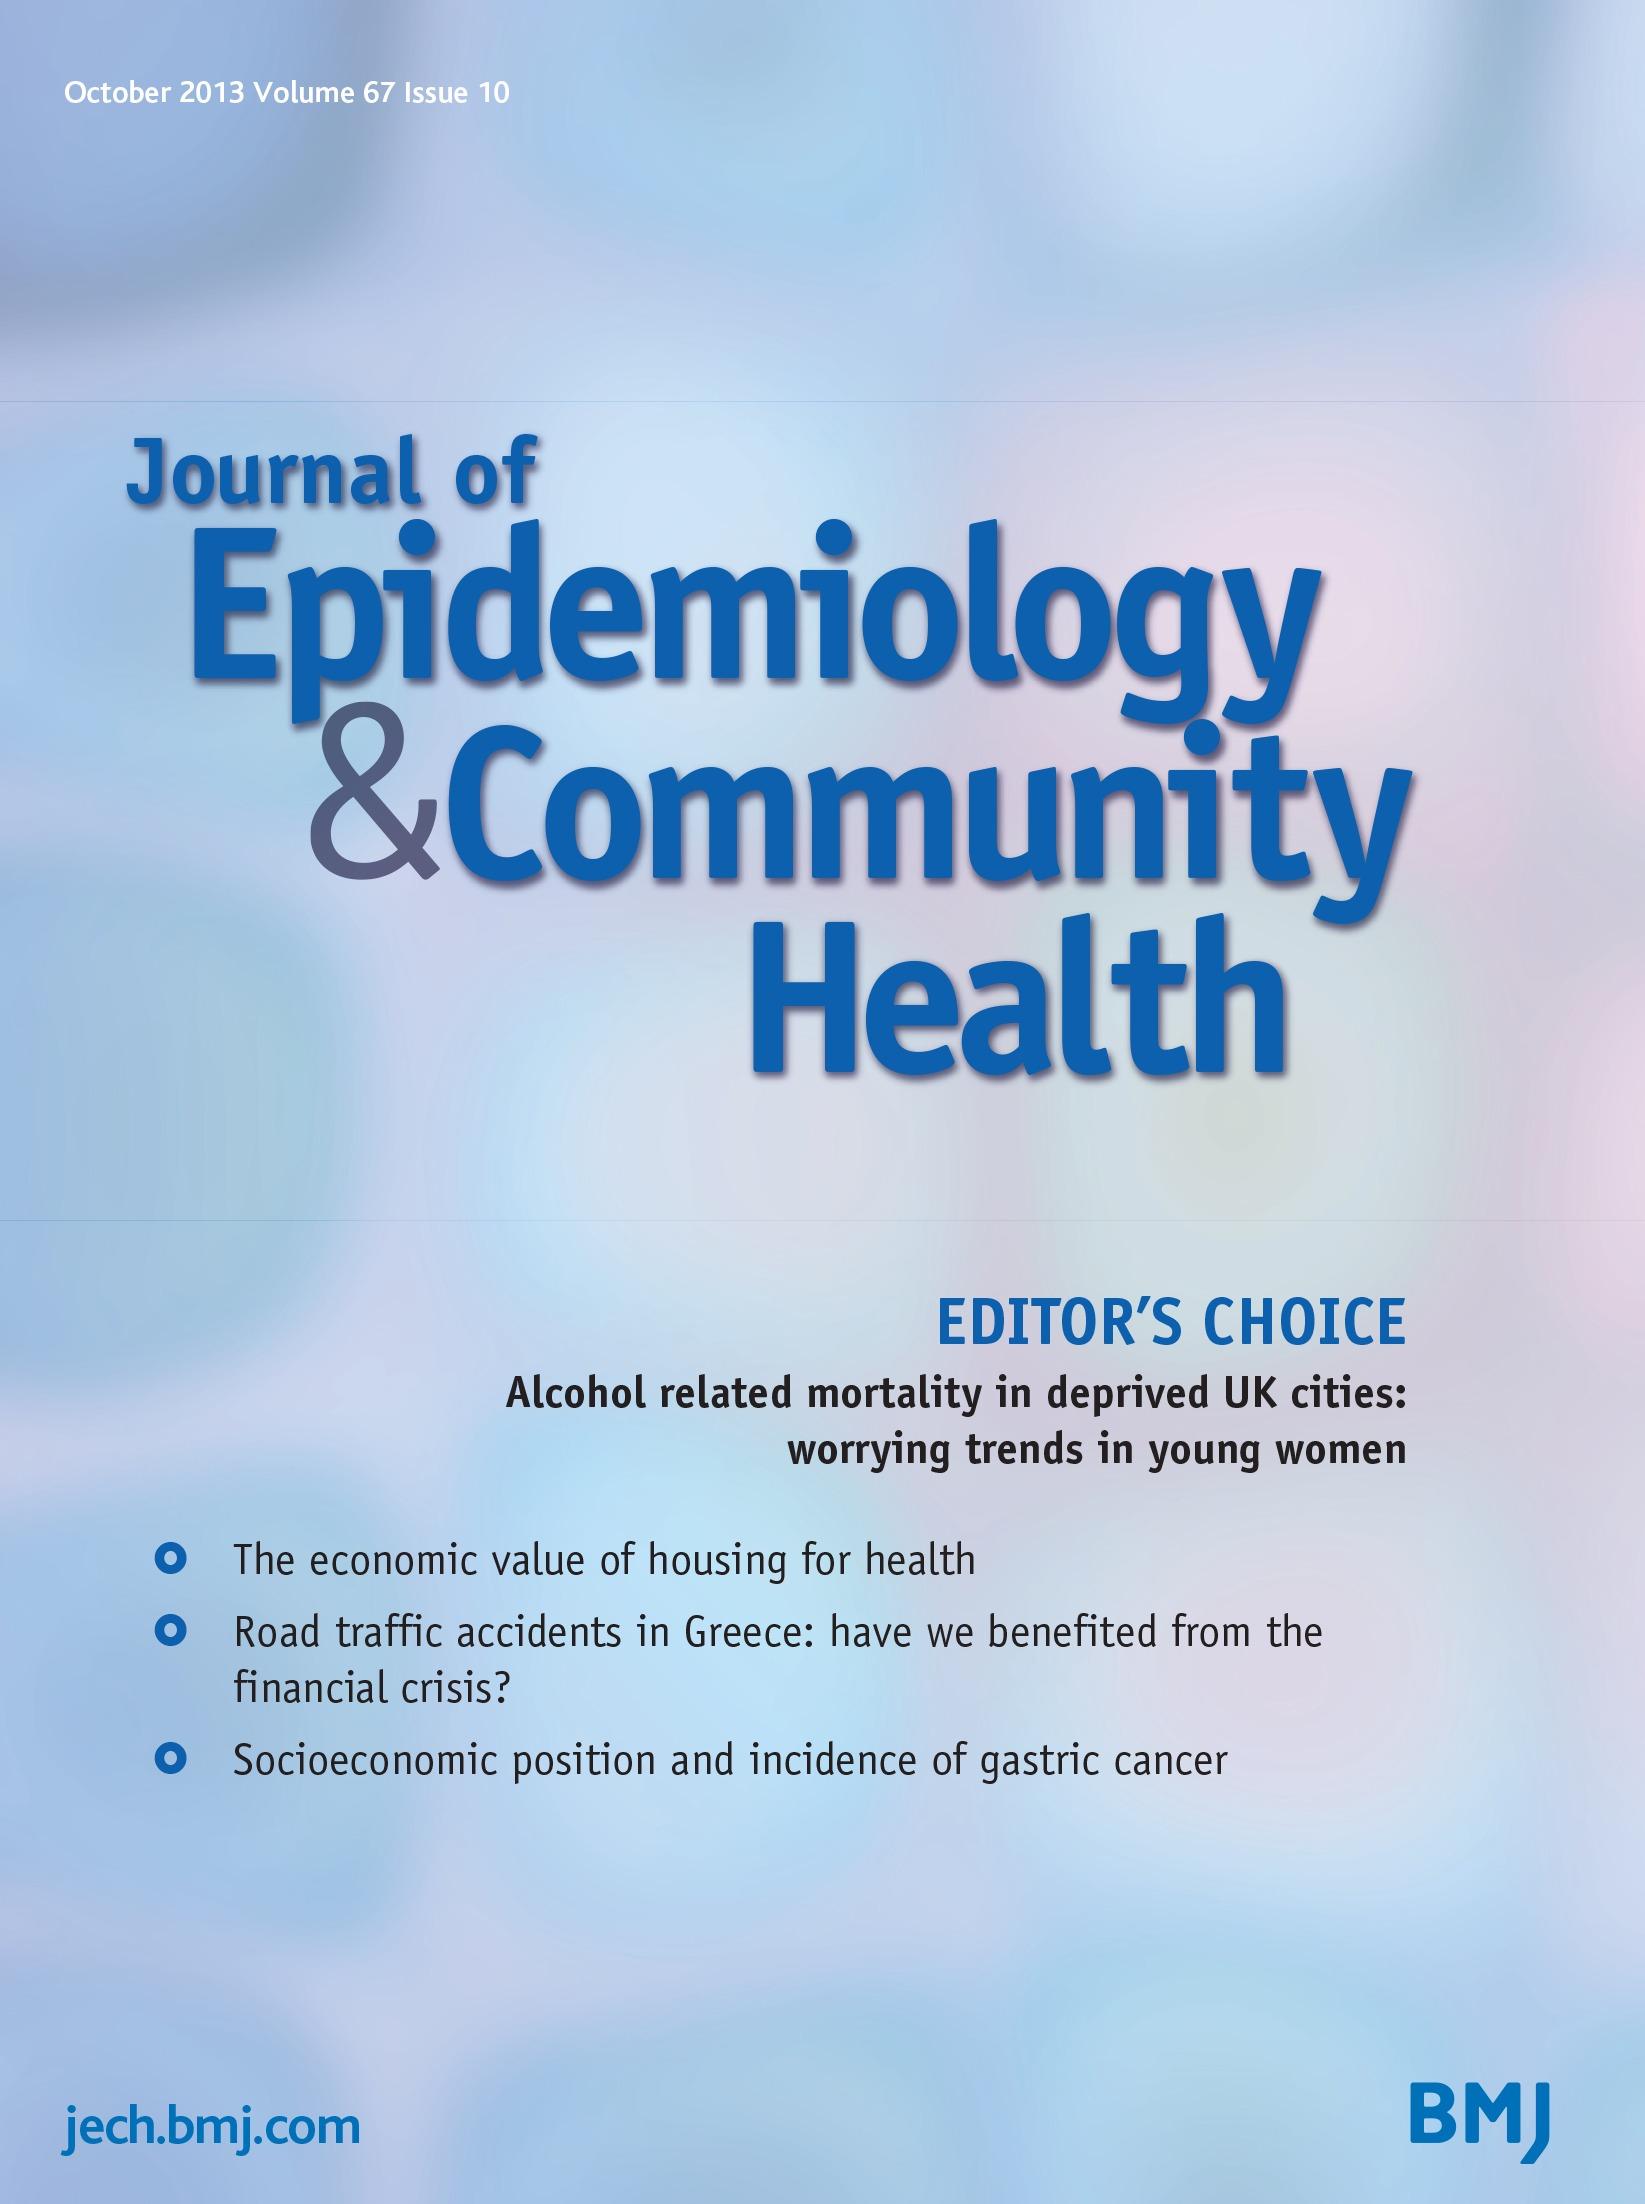 Economic analysis of the health impacts of housing improvement